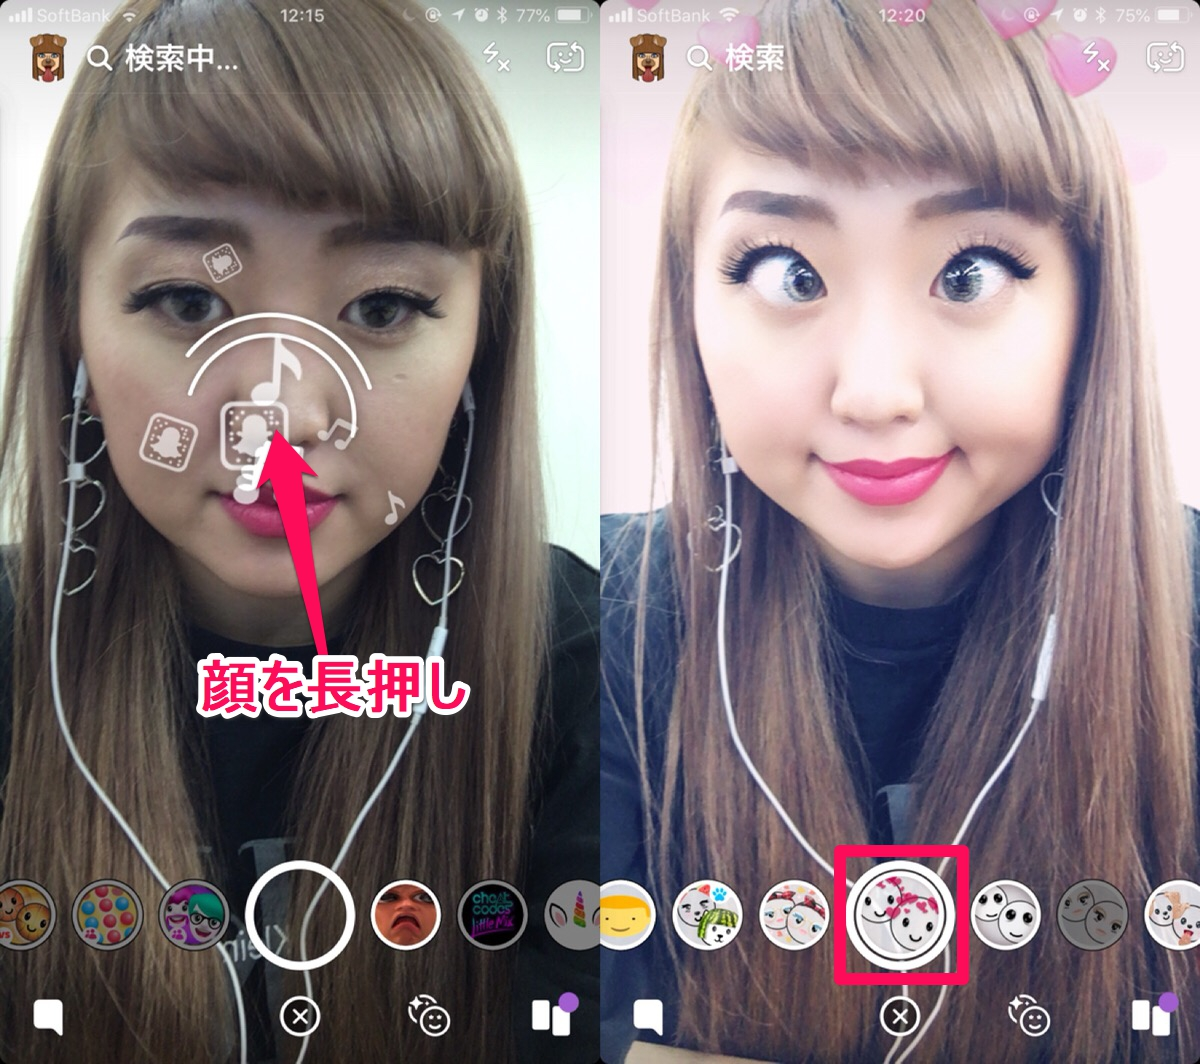 snapchat-hands-free